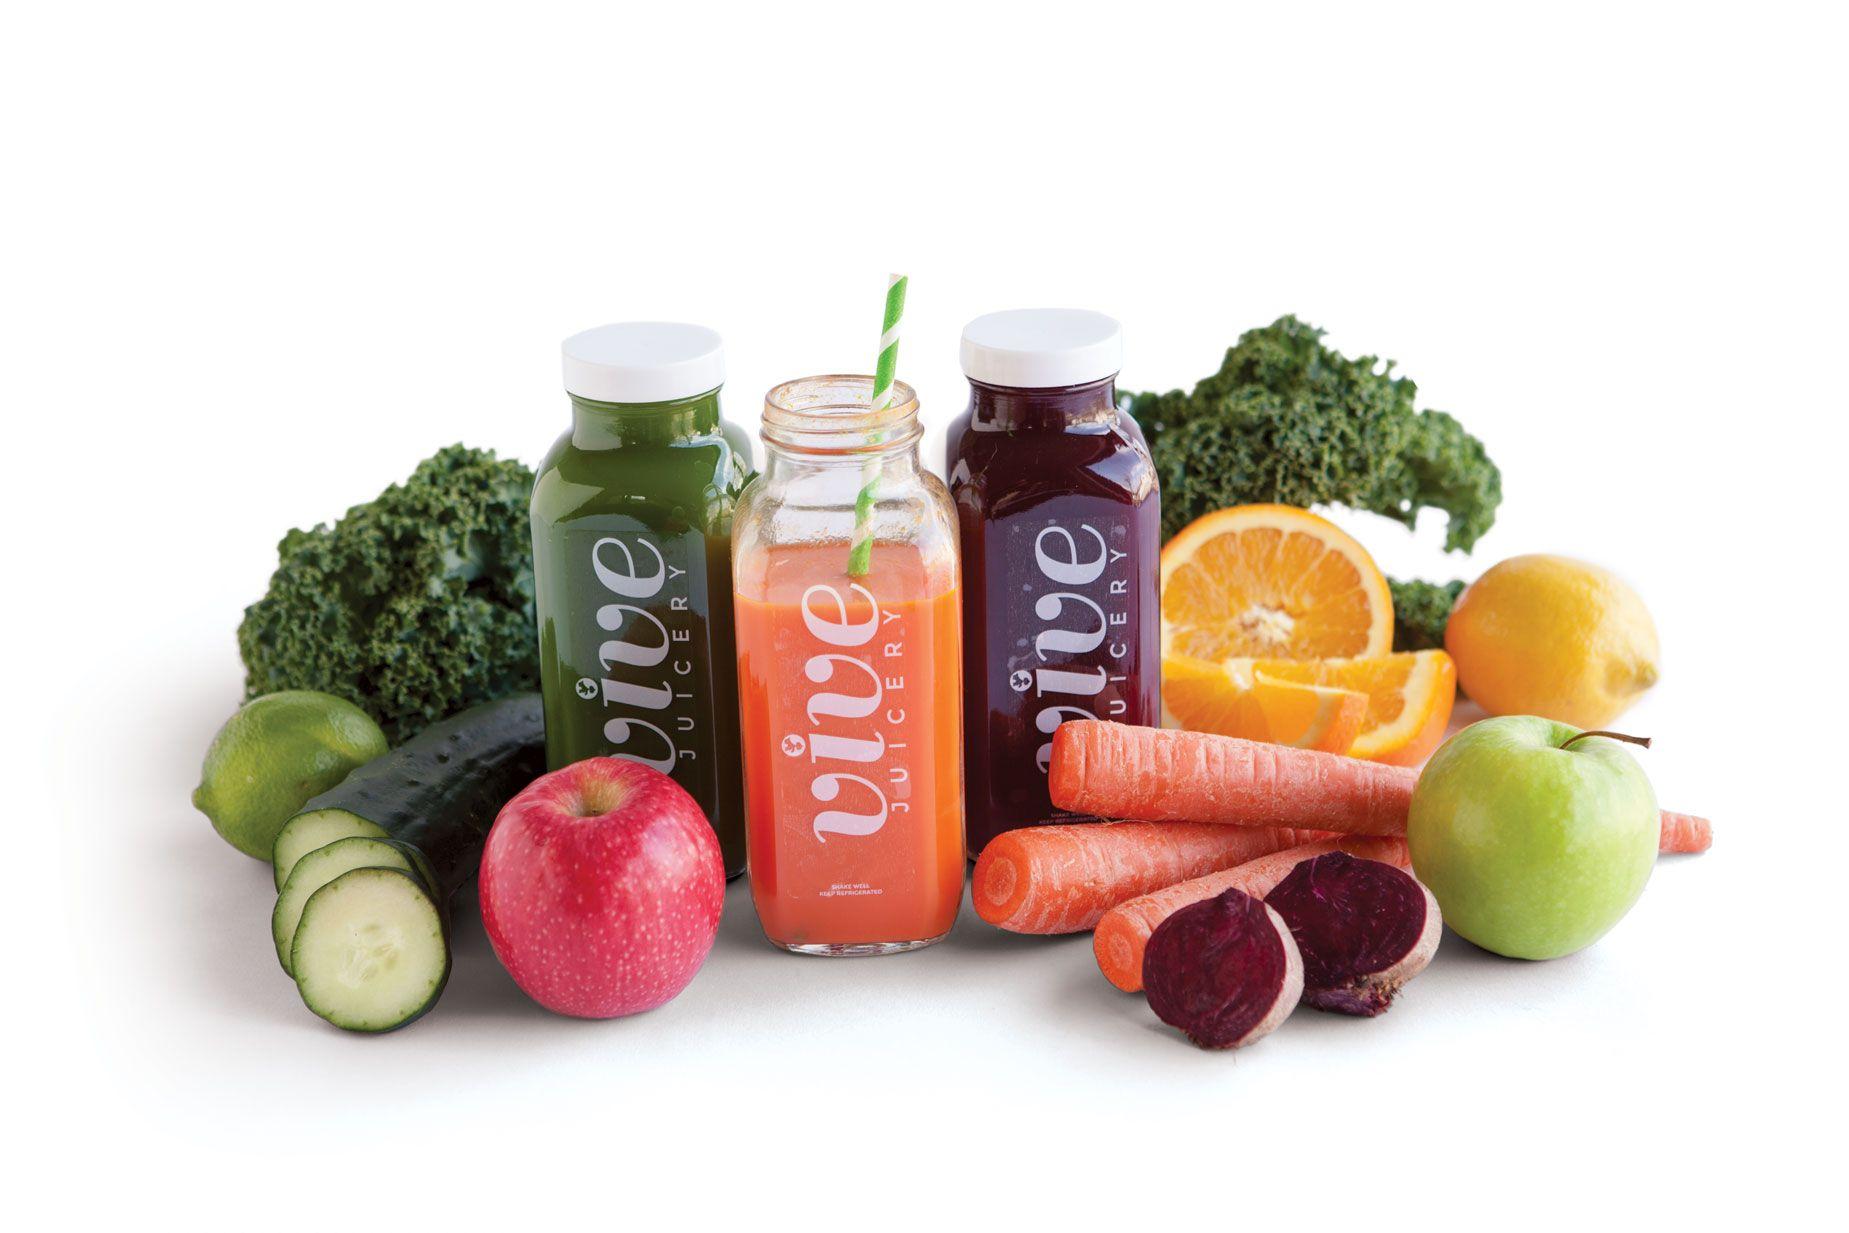 WT0C1752 Clean diet, Juice cleanse, Diet